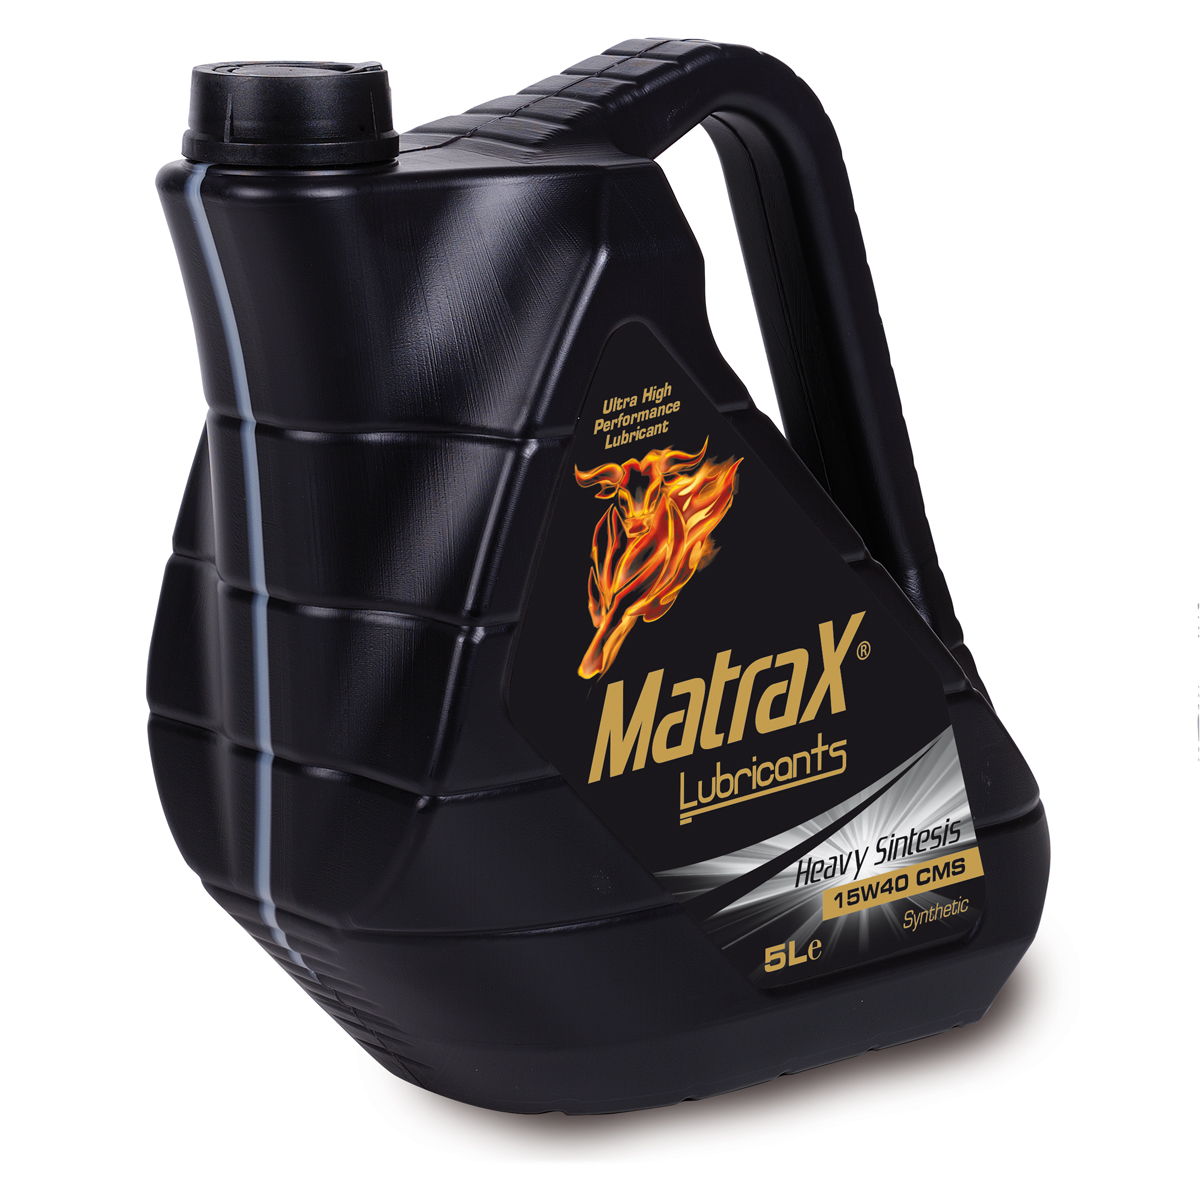 matrax-lubricants-heavy-sintesis-15w40-CMS-5l